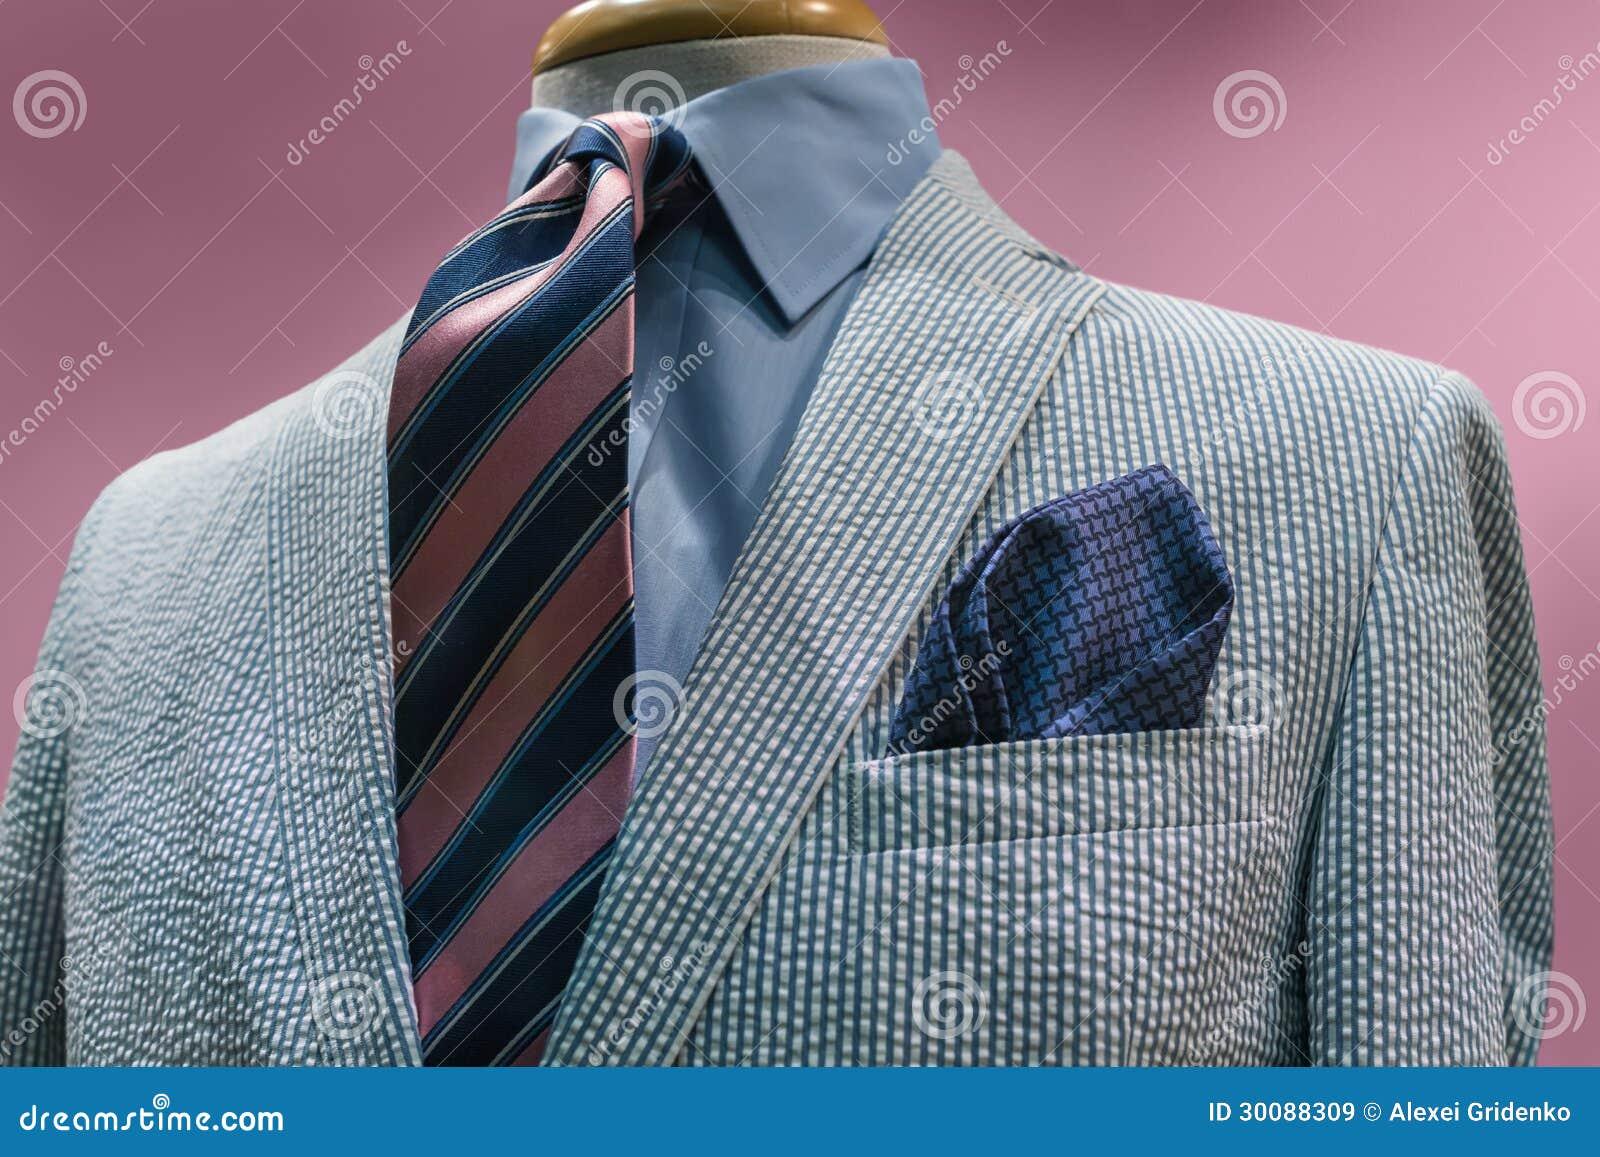 White & Blue Seersucker Jacket With Striped Tie Stock Image - Image ...